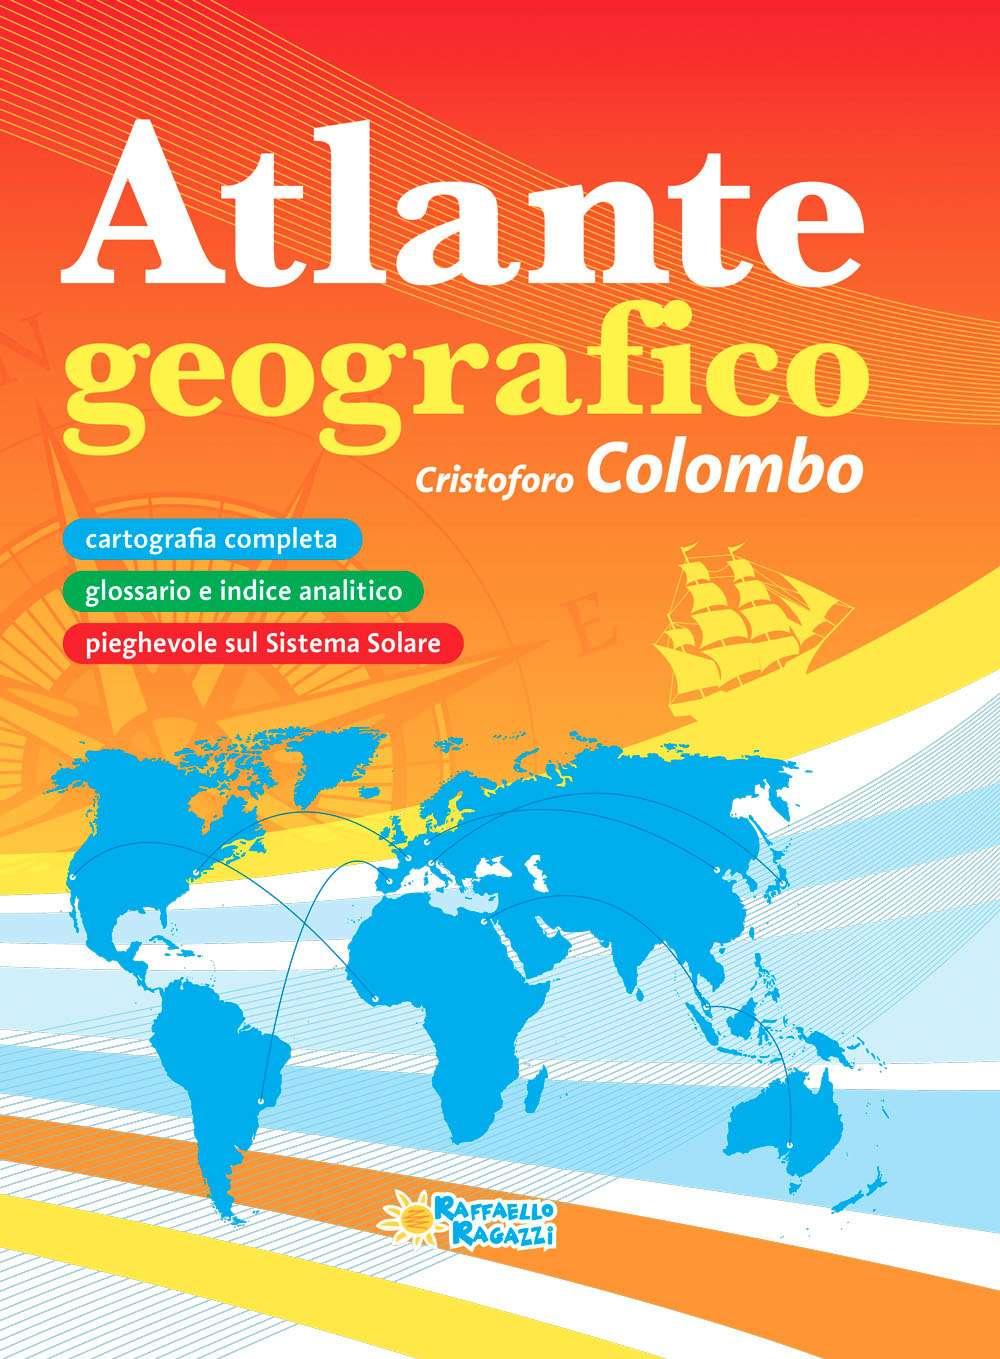 Atlante geografico Cristoforo Colombo